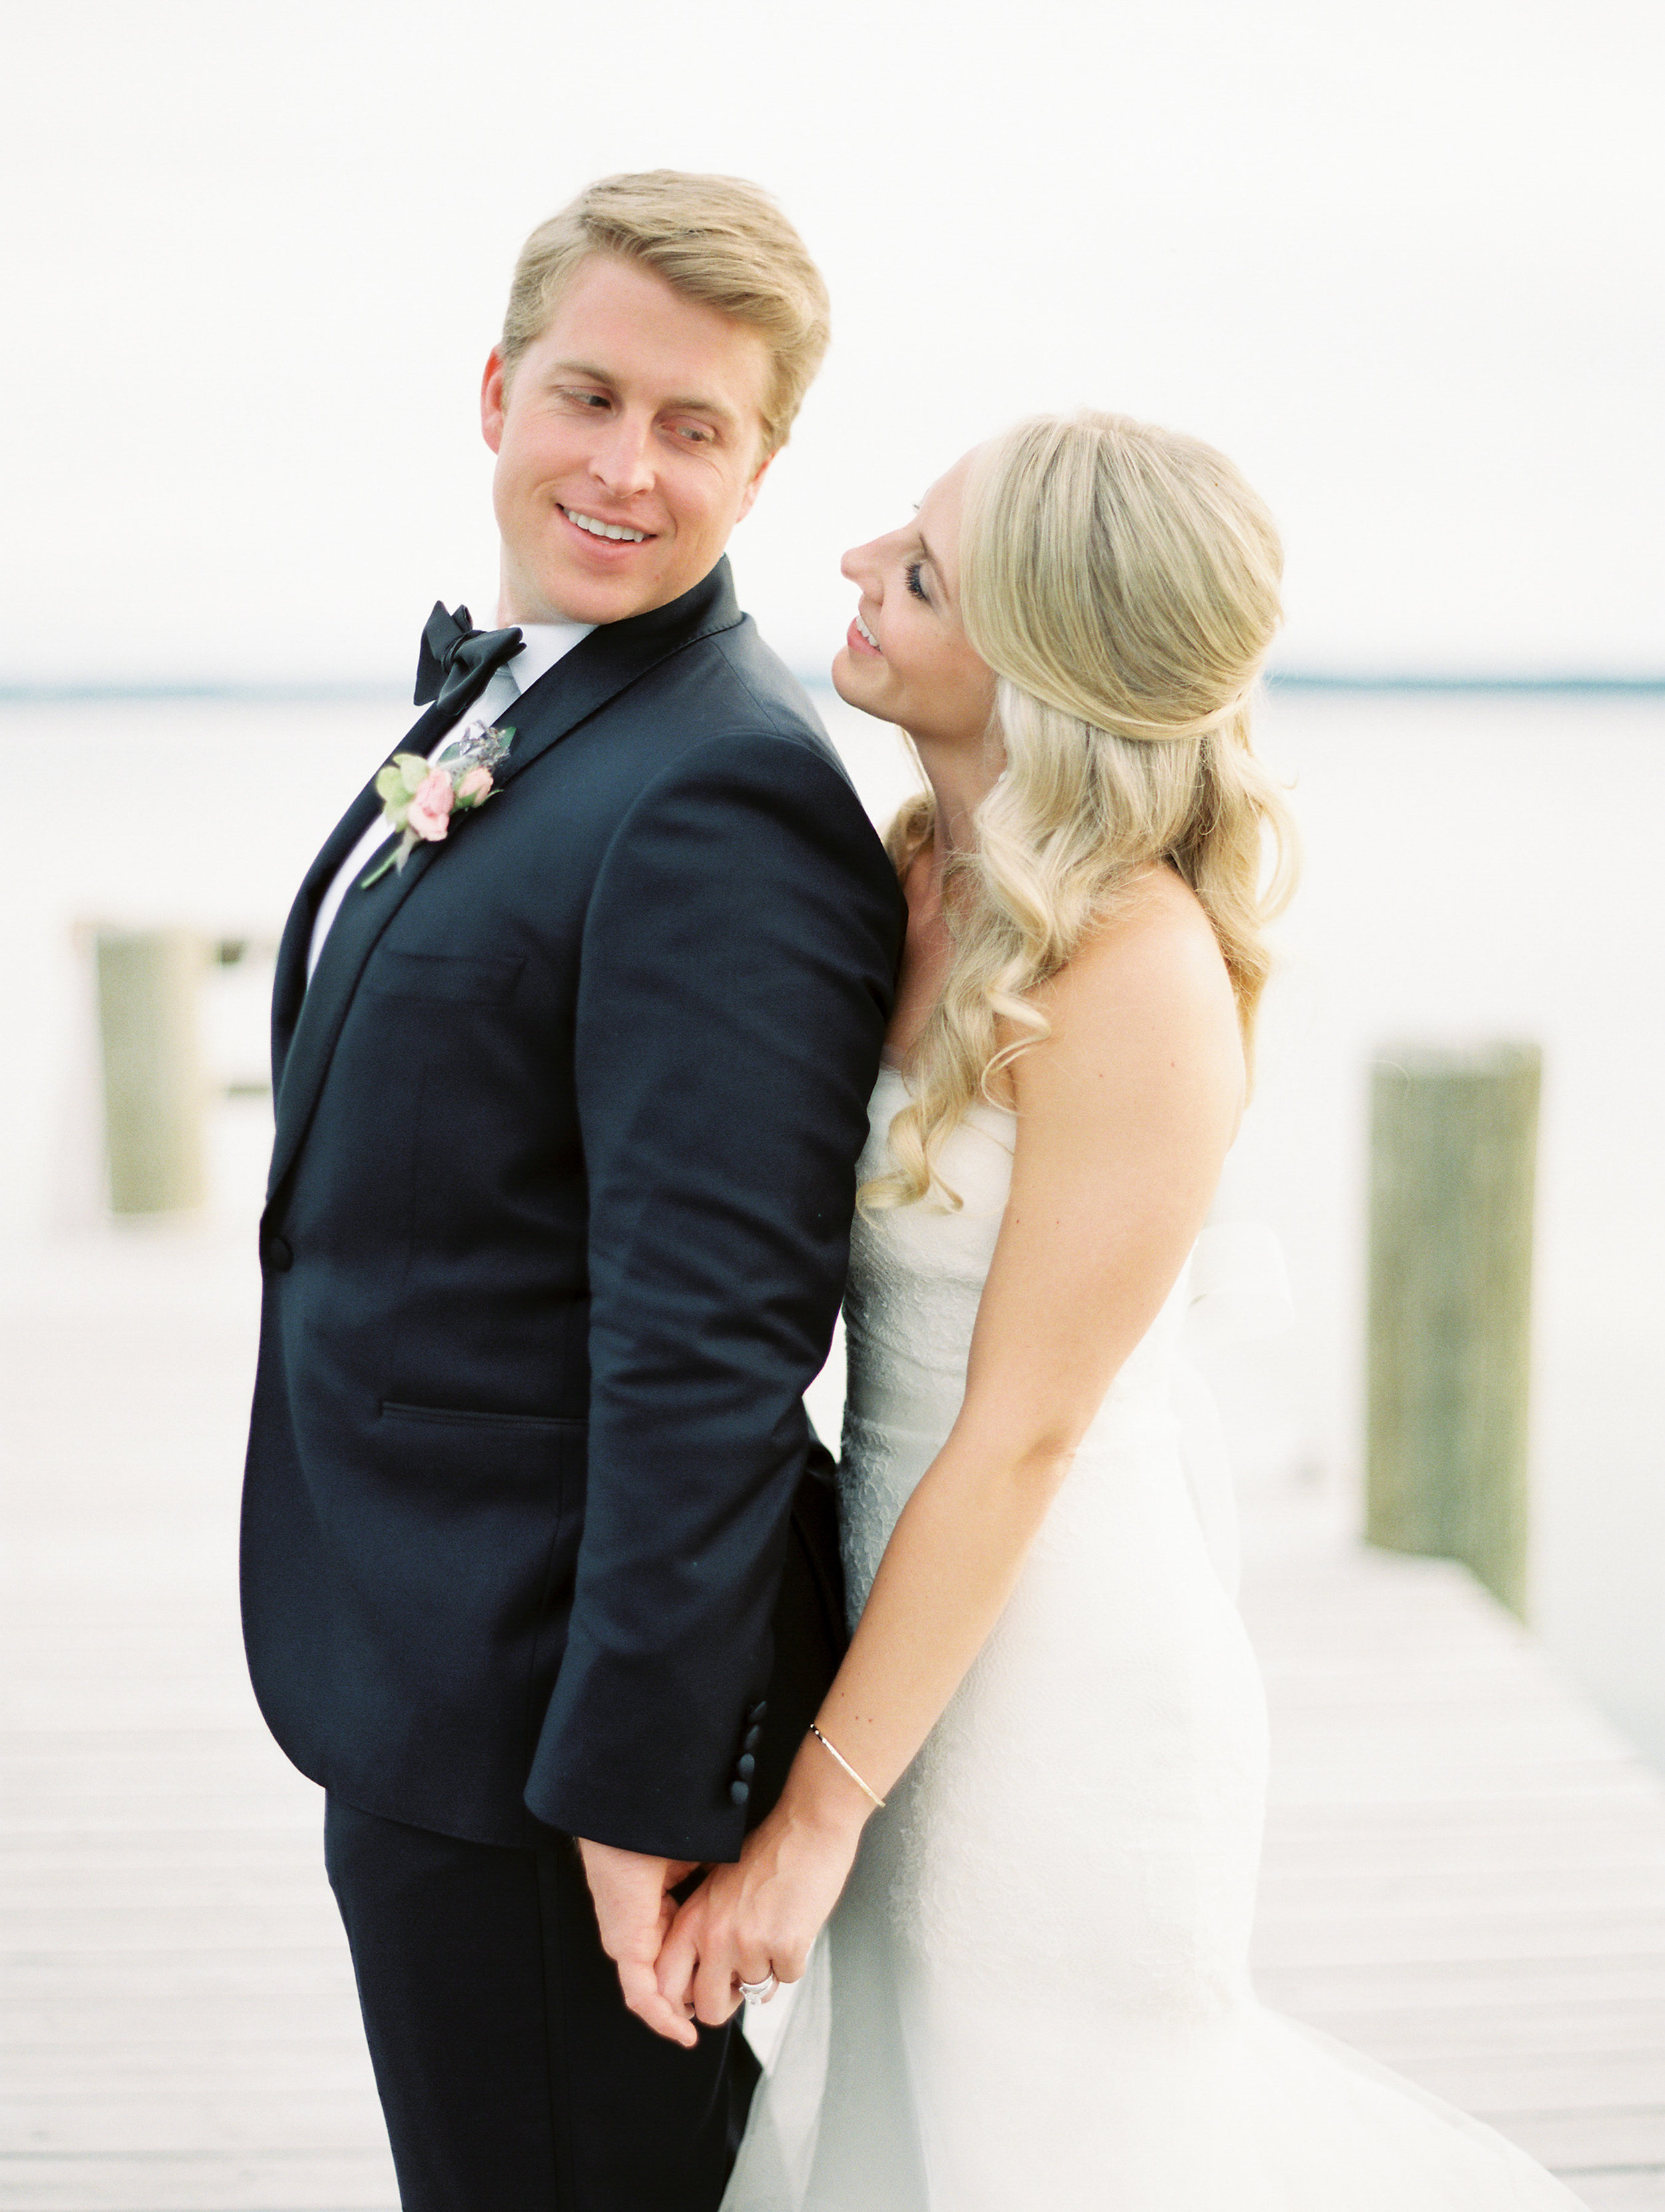 Coffman+Wedding+Bride+Groom+Sunset-57.jpg